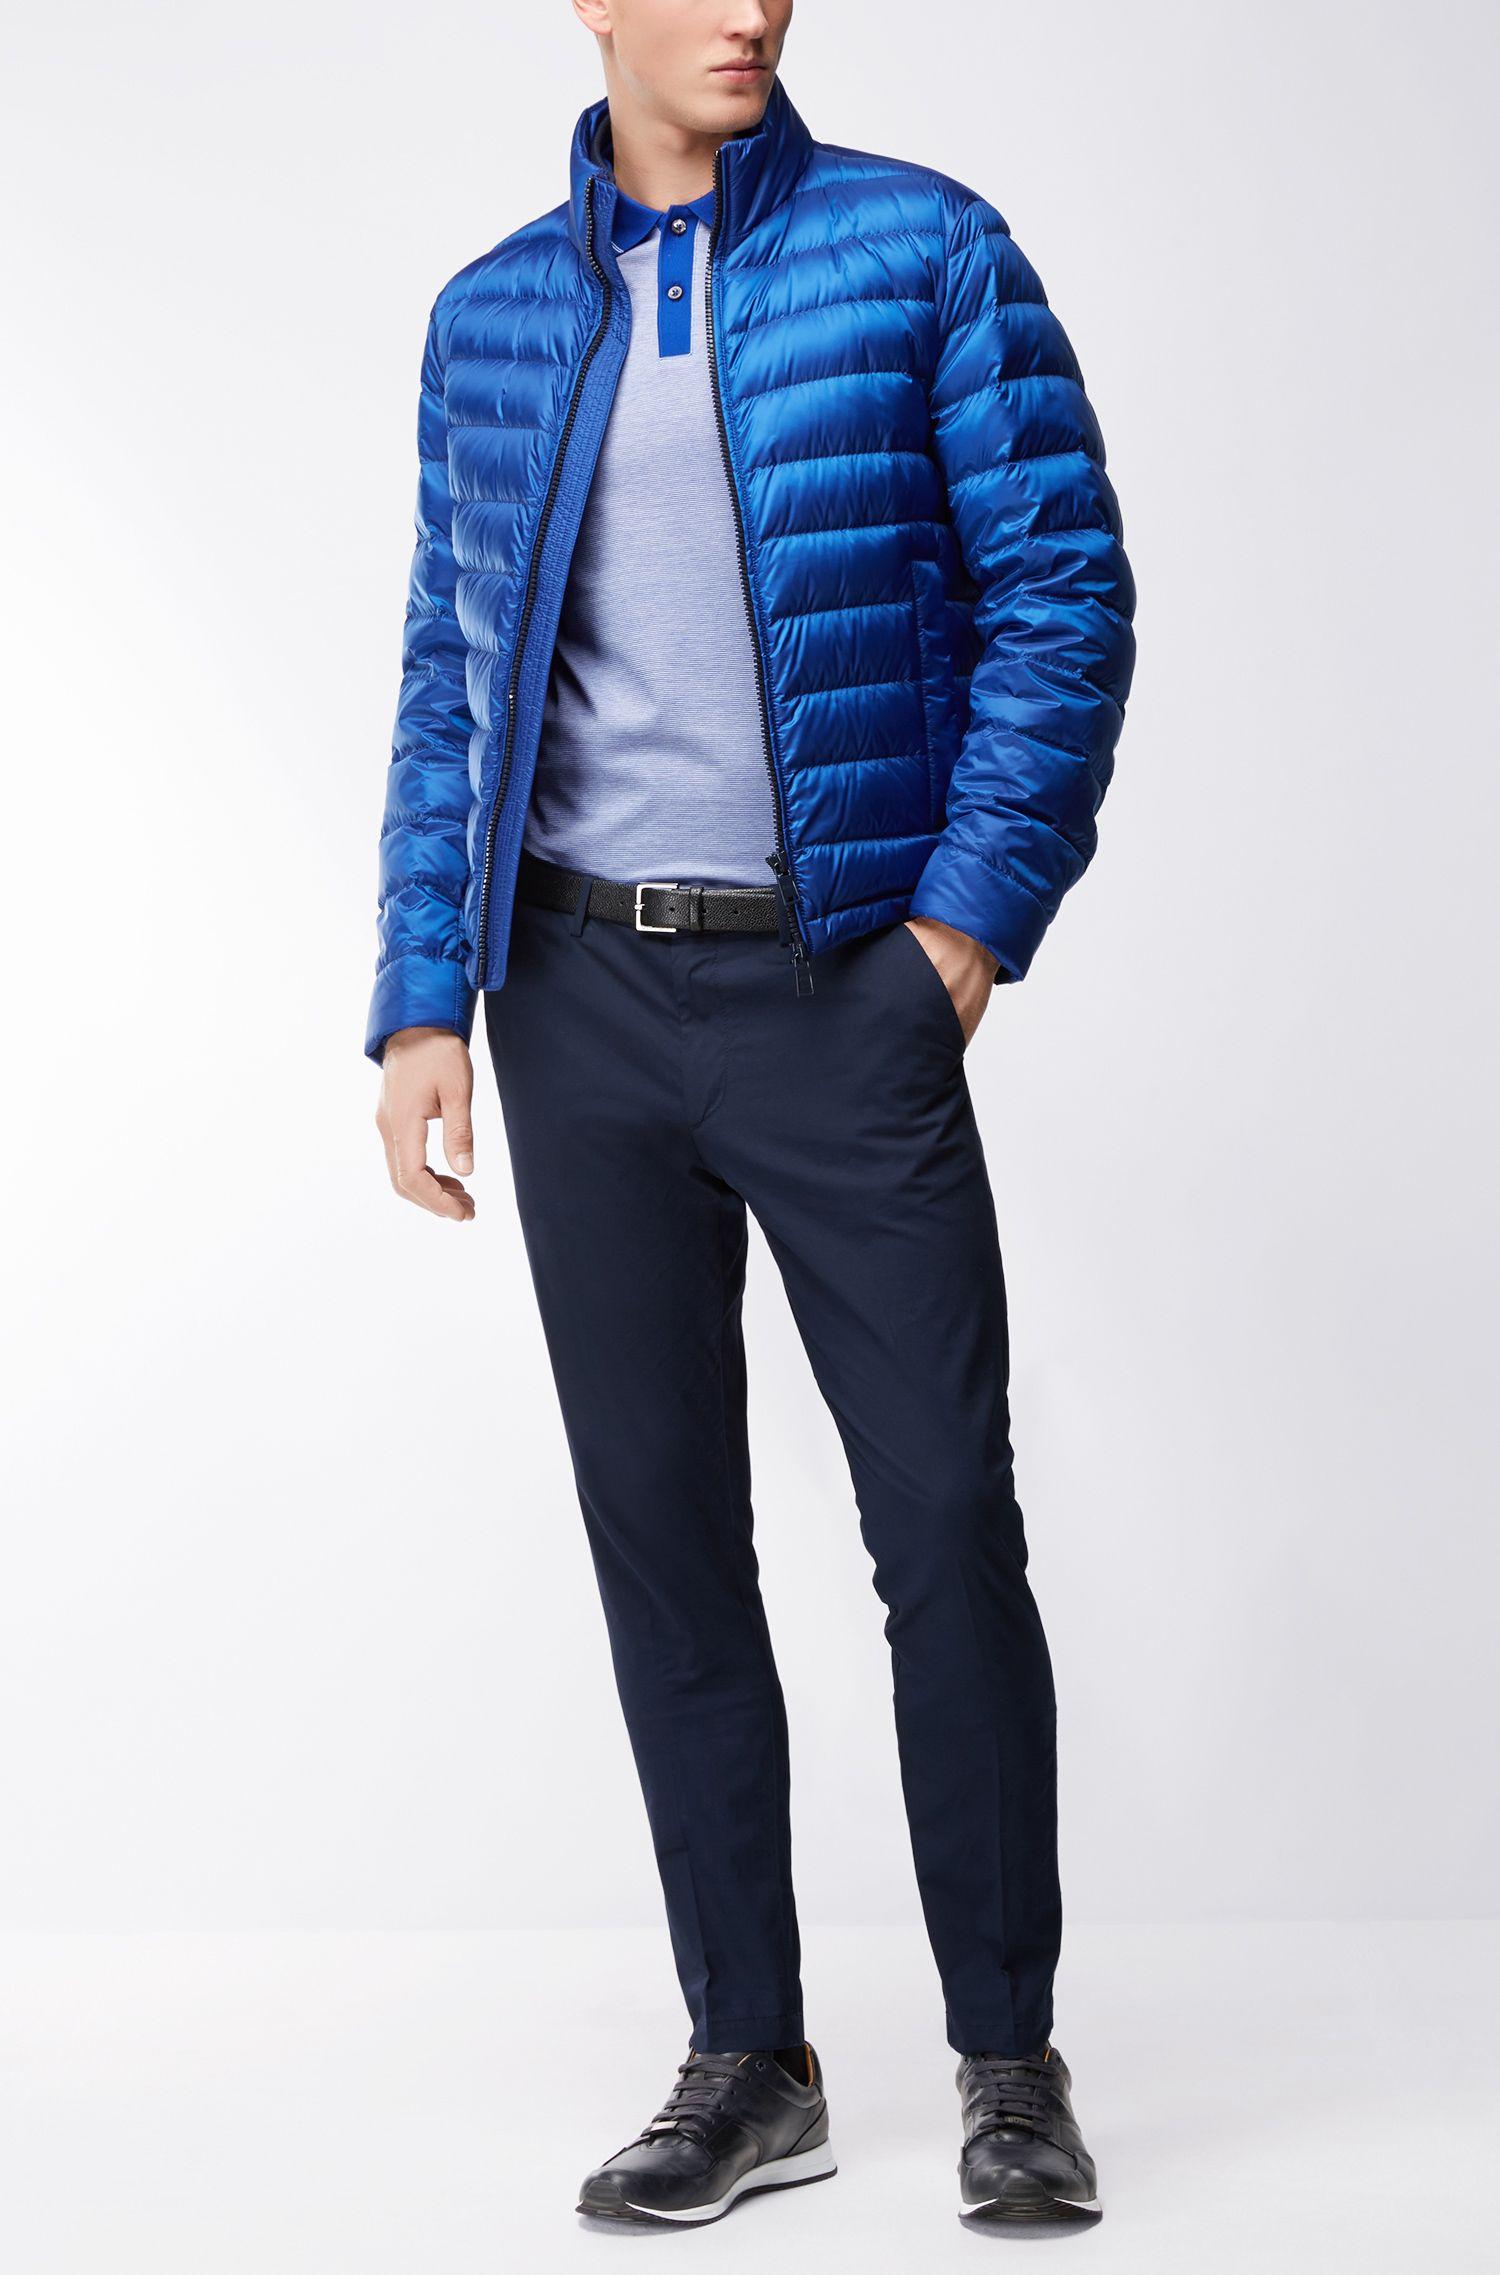 Mercerized Cotton Polo Shirt, Slim Fit | Phillipson